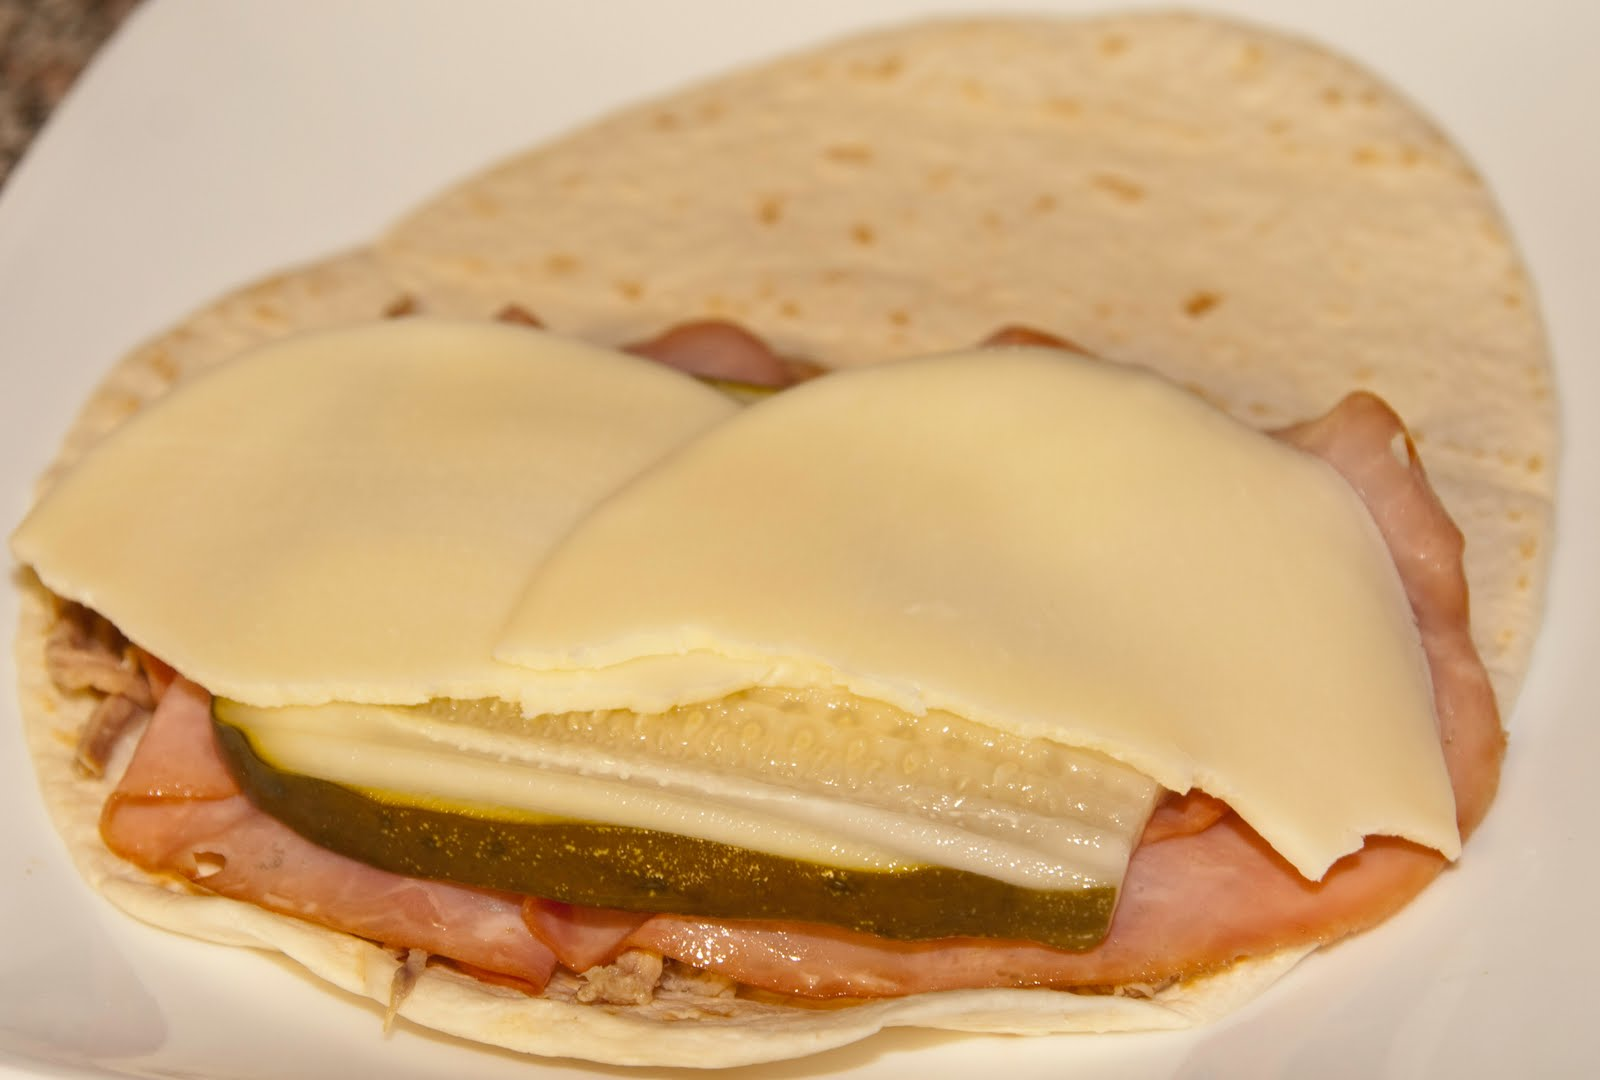 Blog About Food: Cuban Sandwich Quesadillas